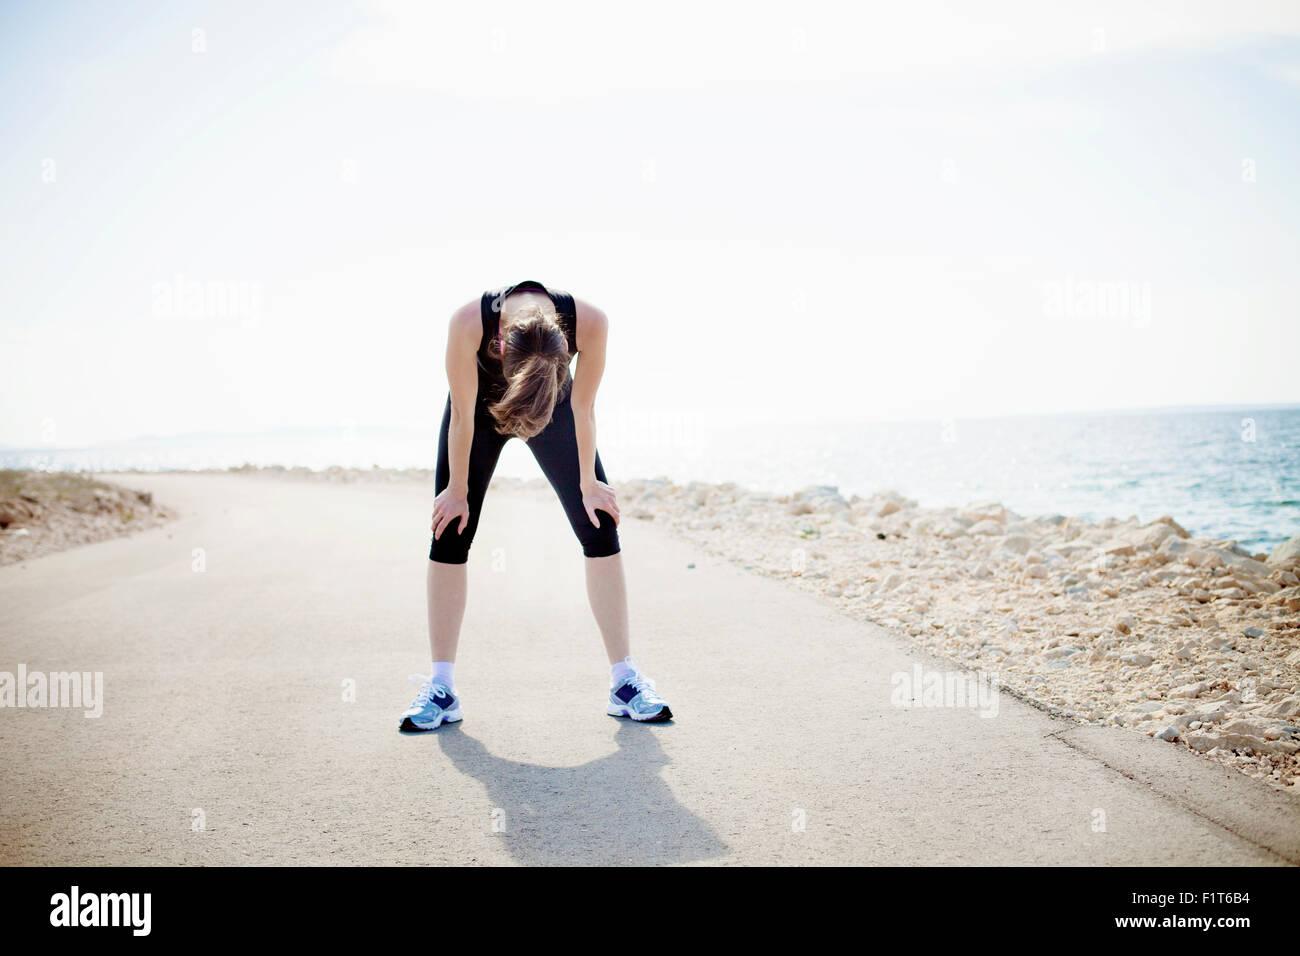 Mujer en ropa deportiva de pie en el waterfront ruta Imagen De Stock